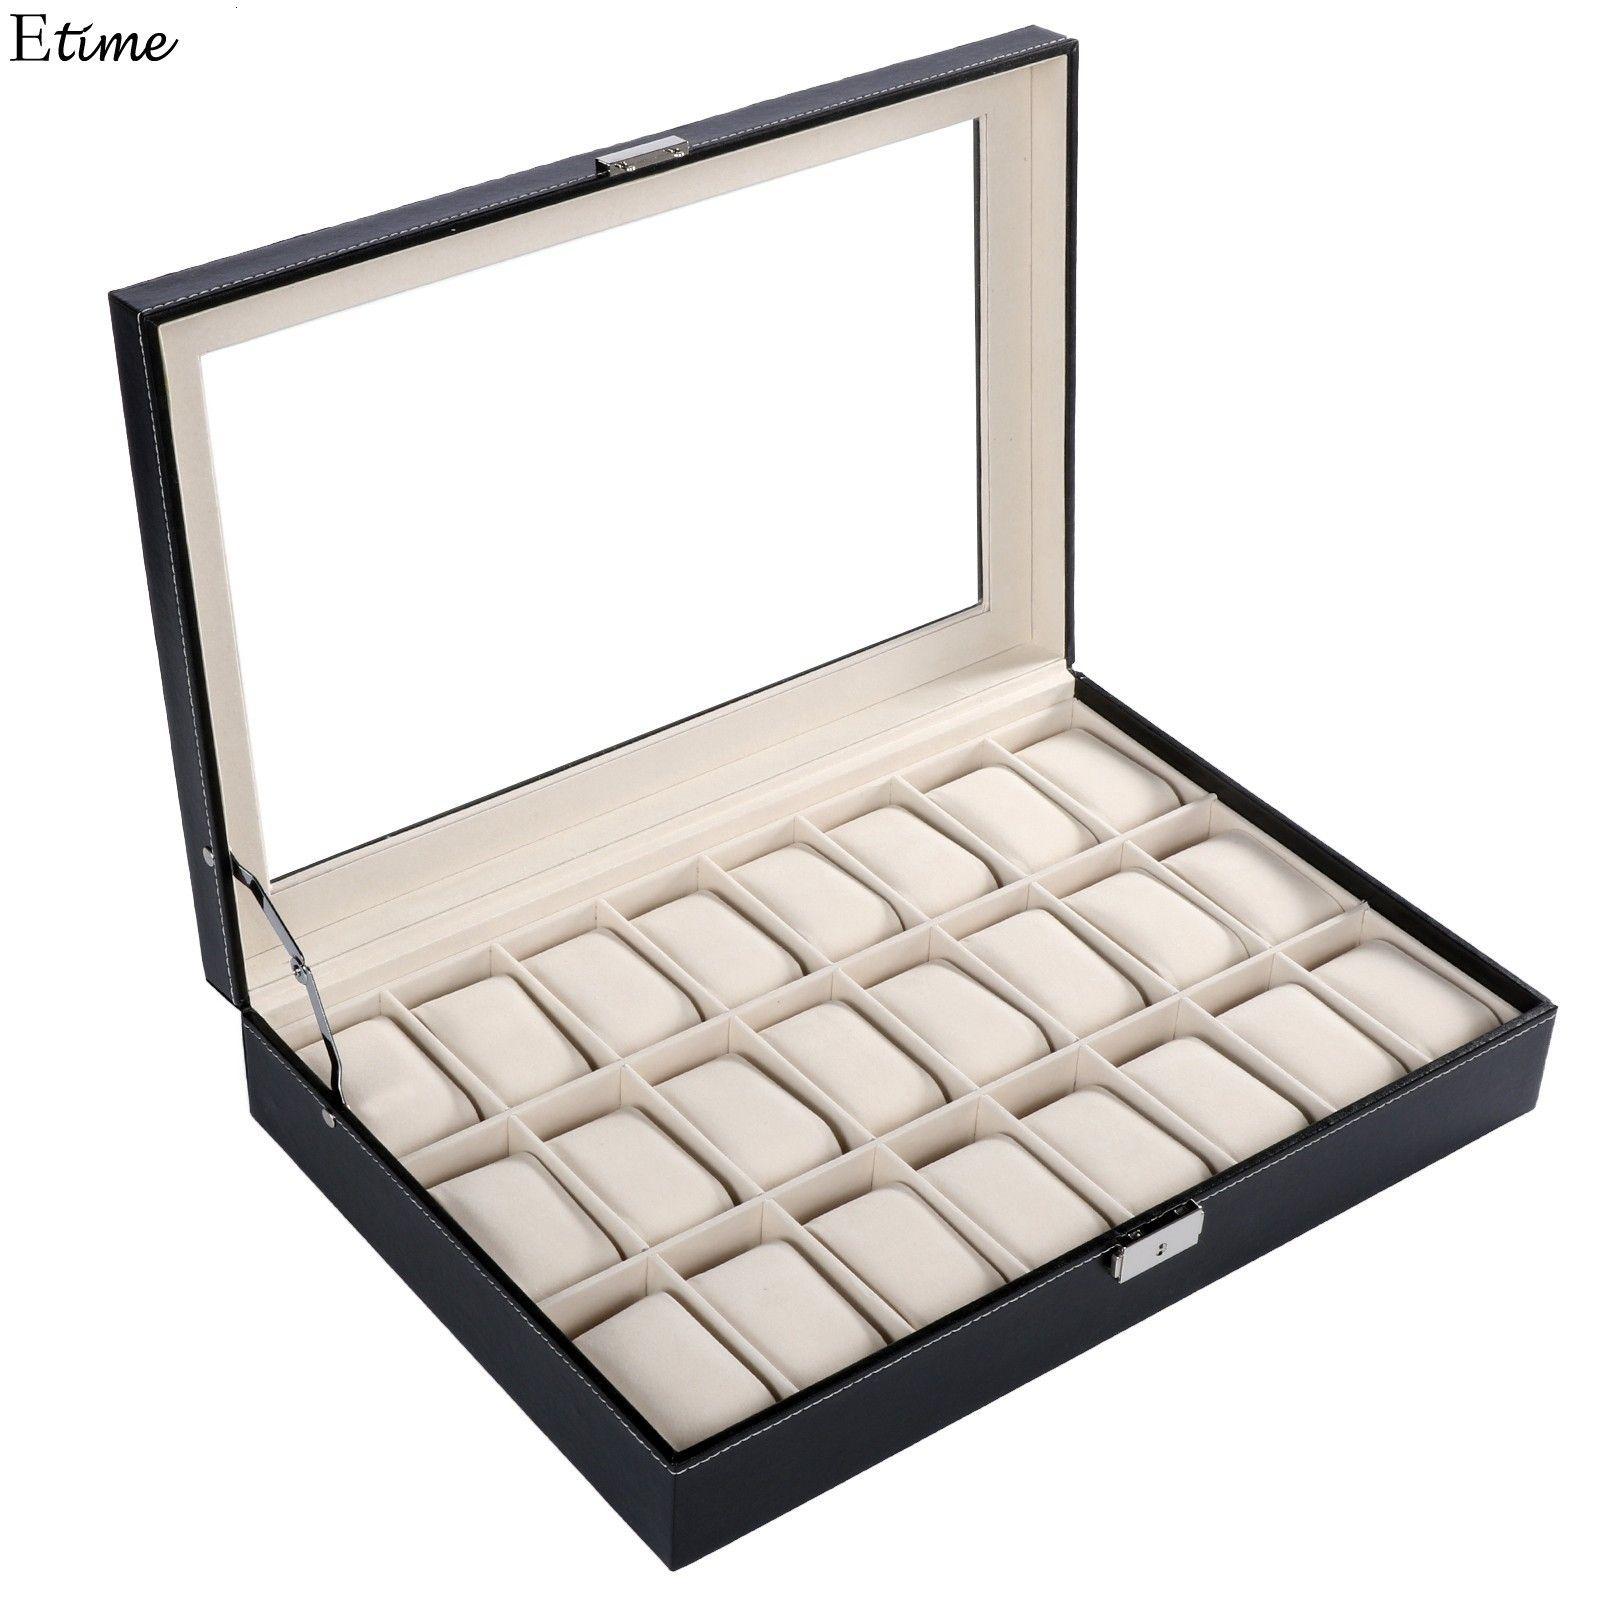 Fanala 24 Сетка Часы Box Высокое качество Pu Leather Watch Display Box Jewelry хранения Организатор для наручные часы Boite Montre 2018 SH190729